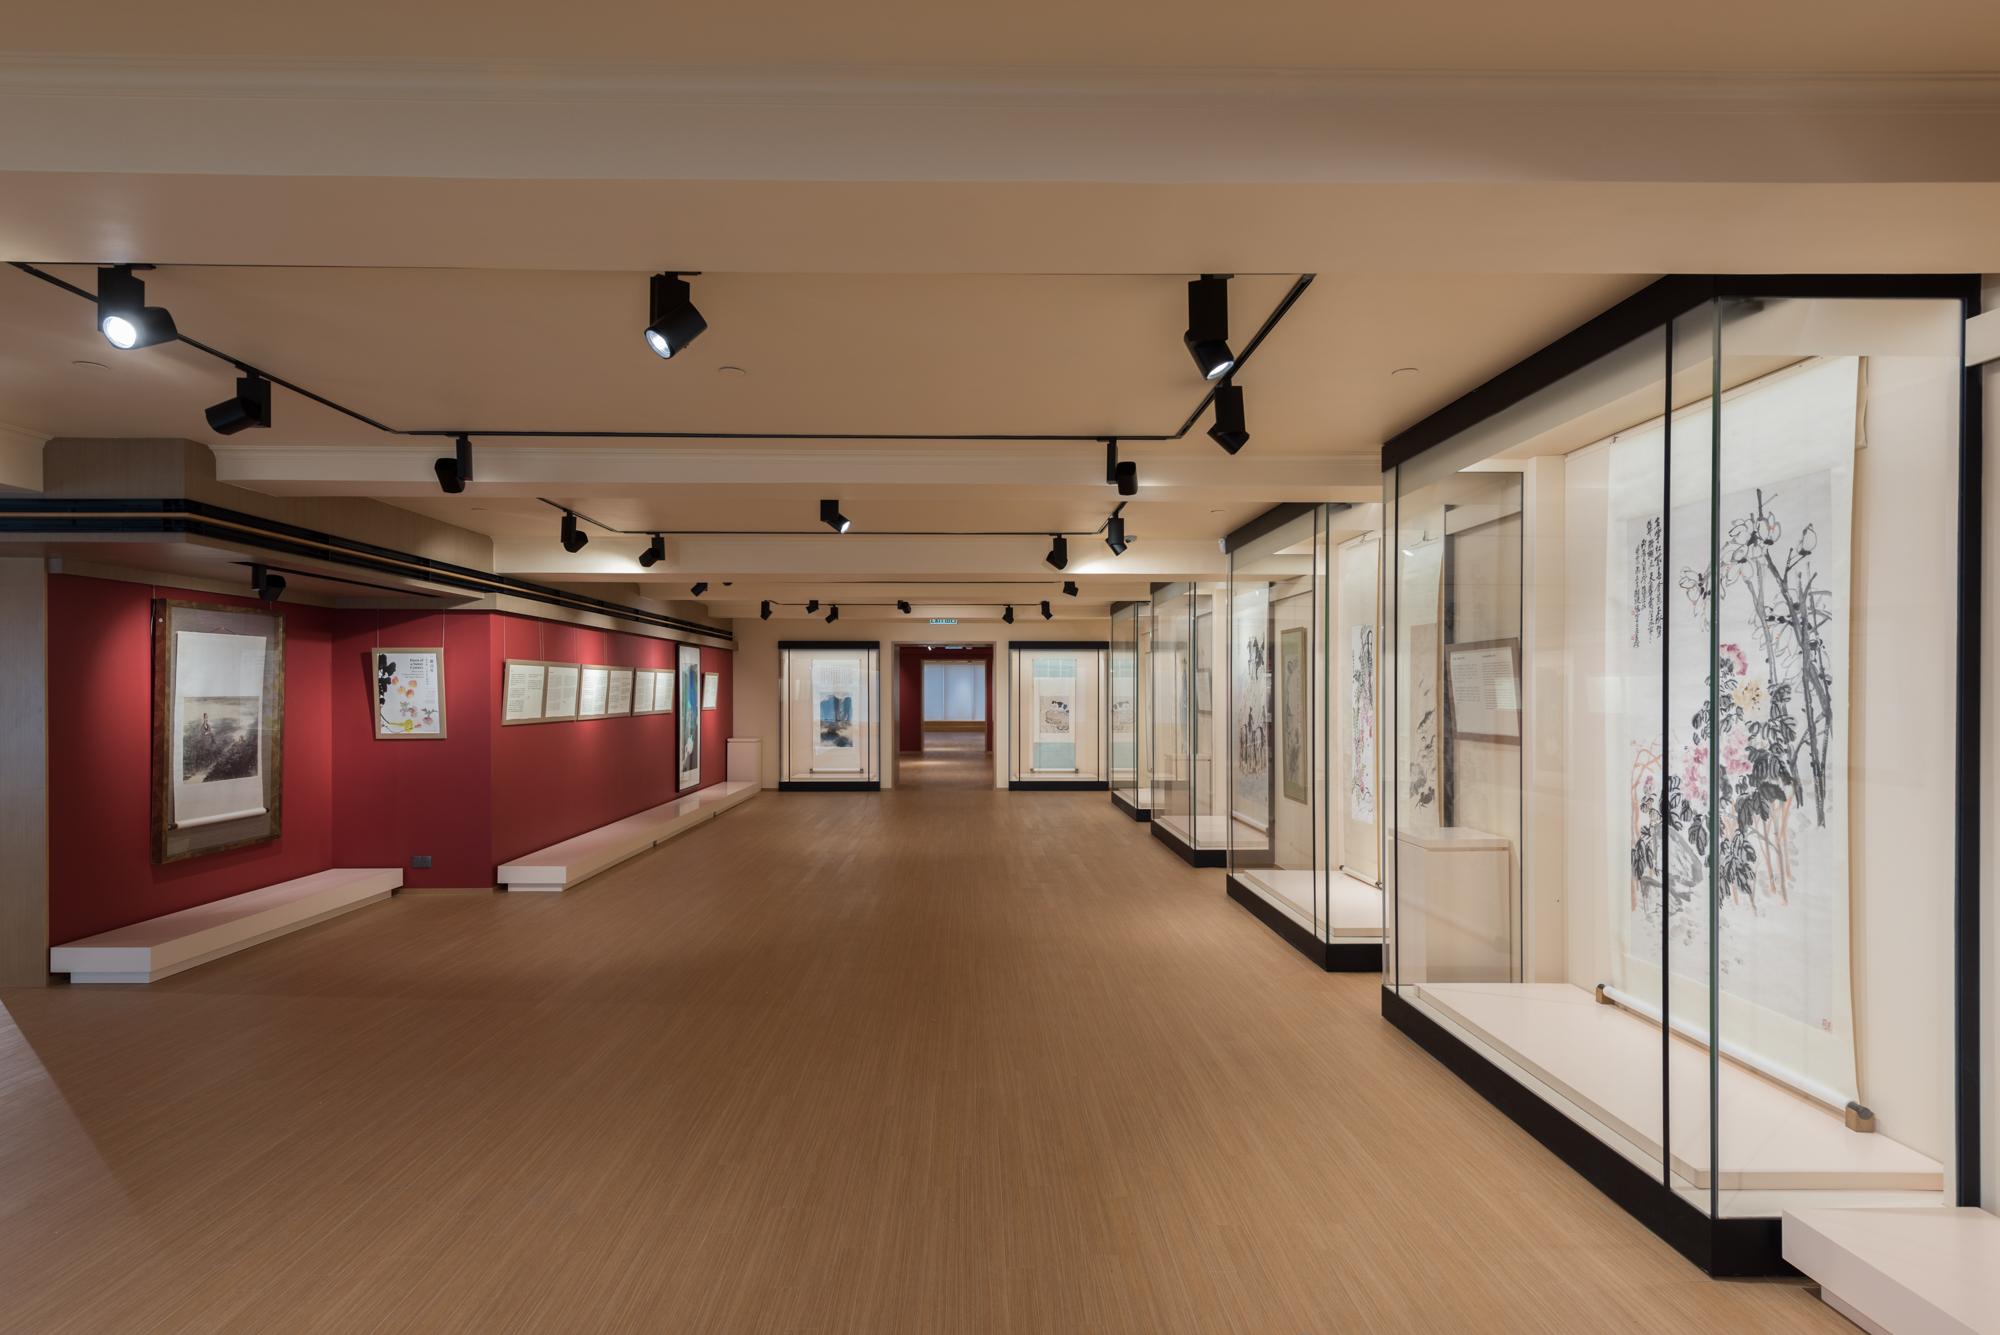 Sun_Museum_interior4.jpg